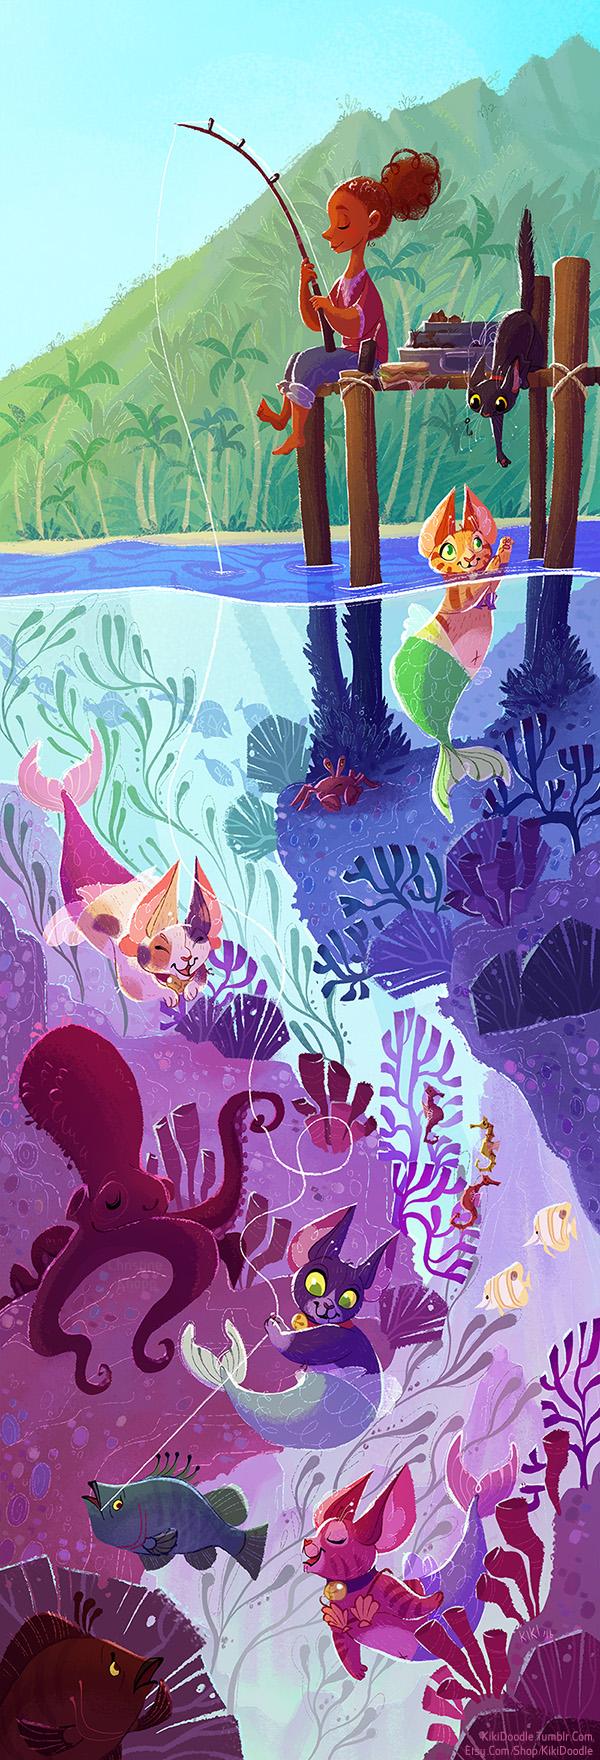 Purrmaid Fishing by kiki-doodle